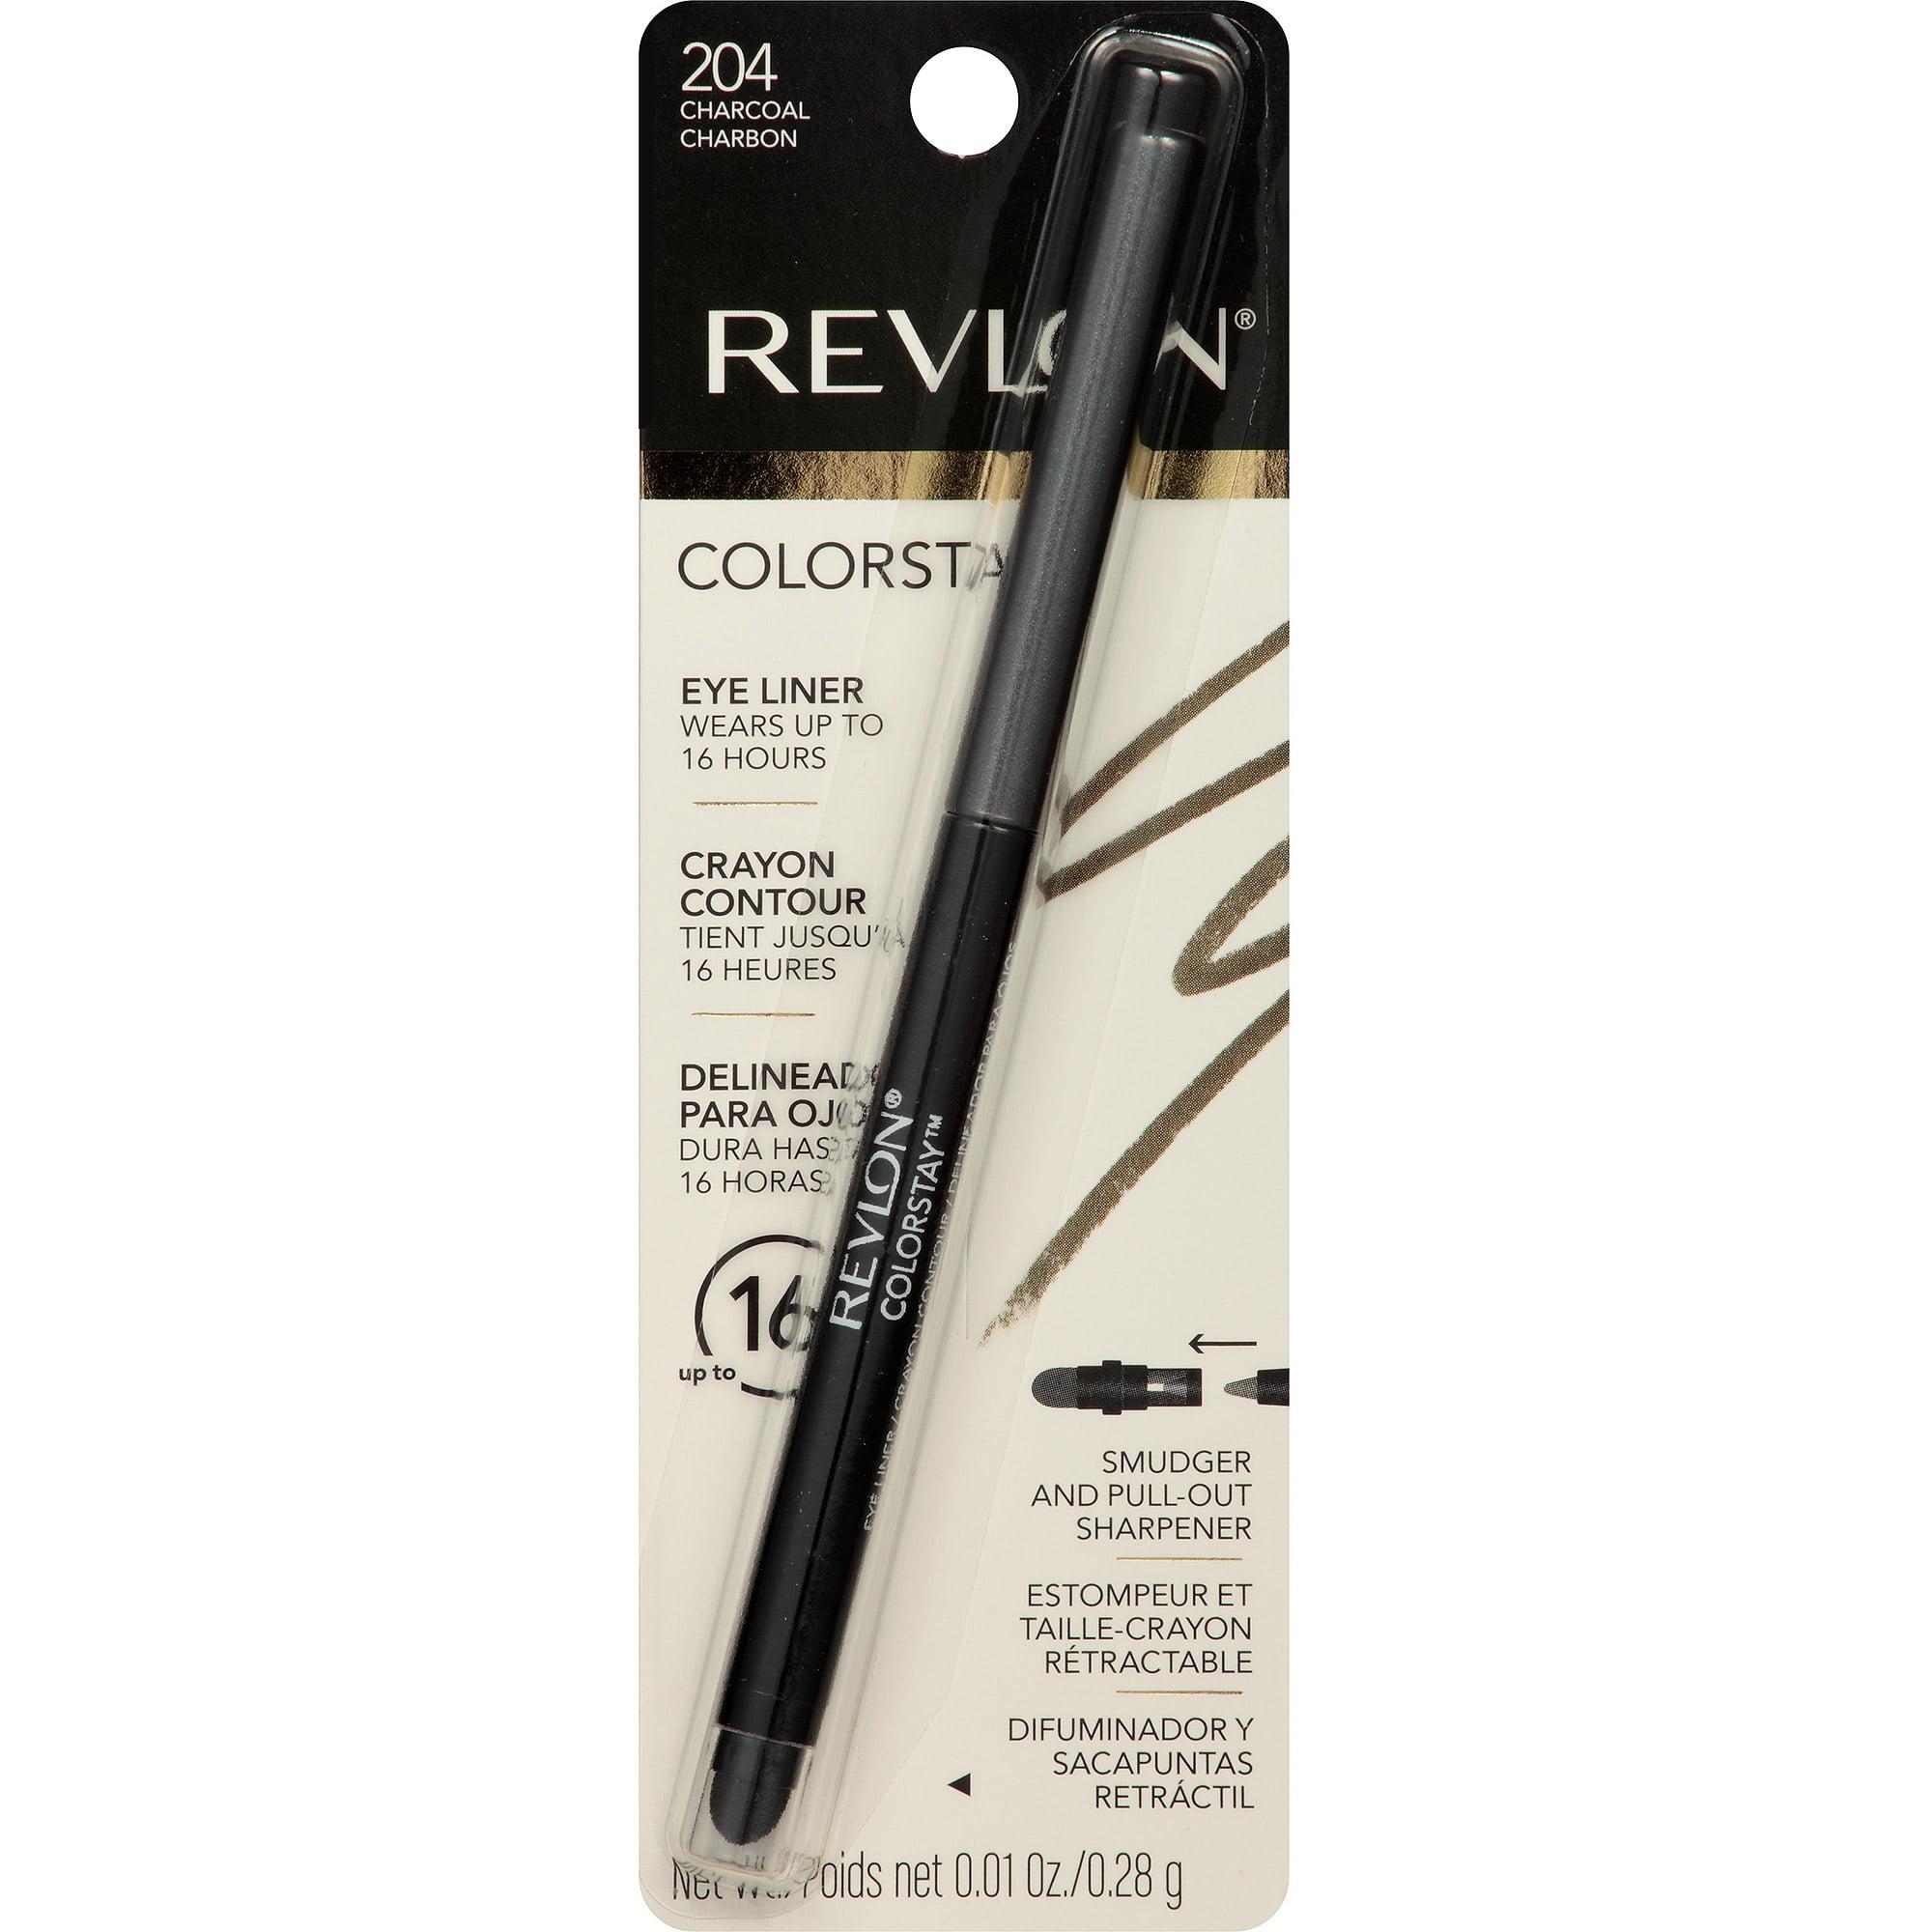 Revlon ColorStay Eyeliner, 204 Charcoal, 0.01 oz